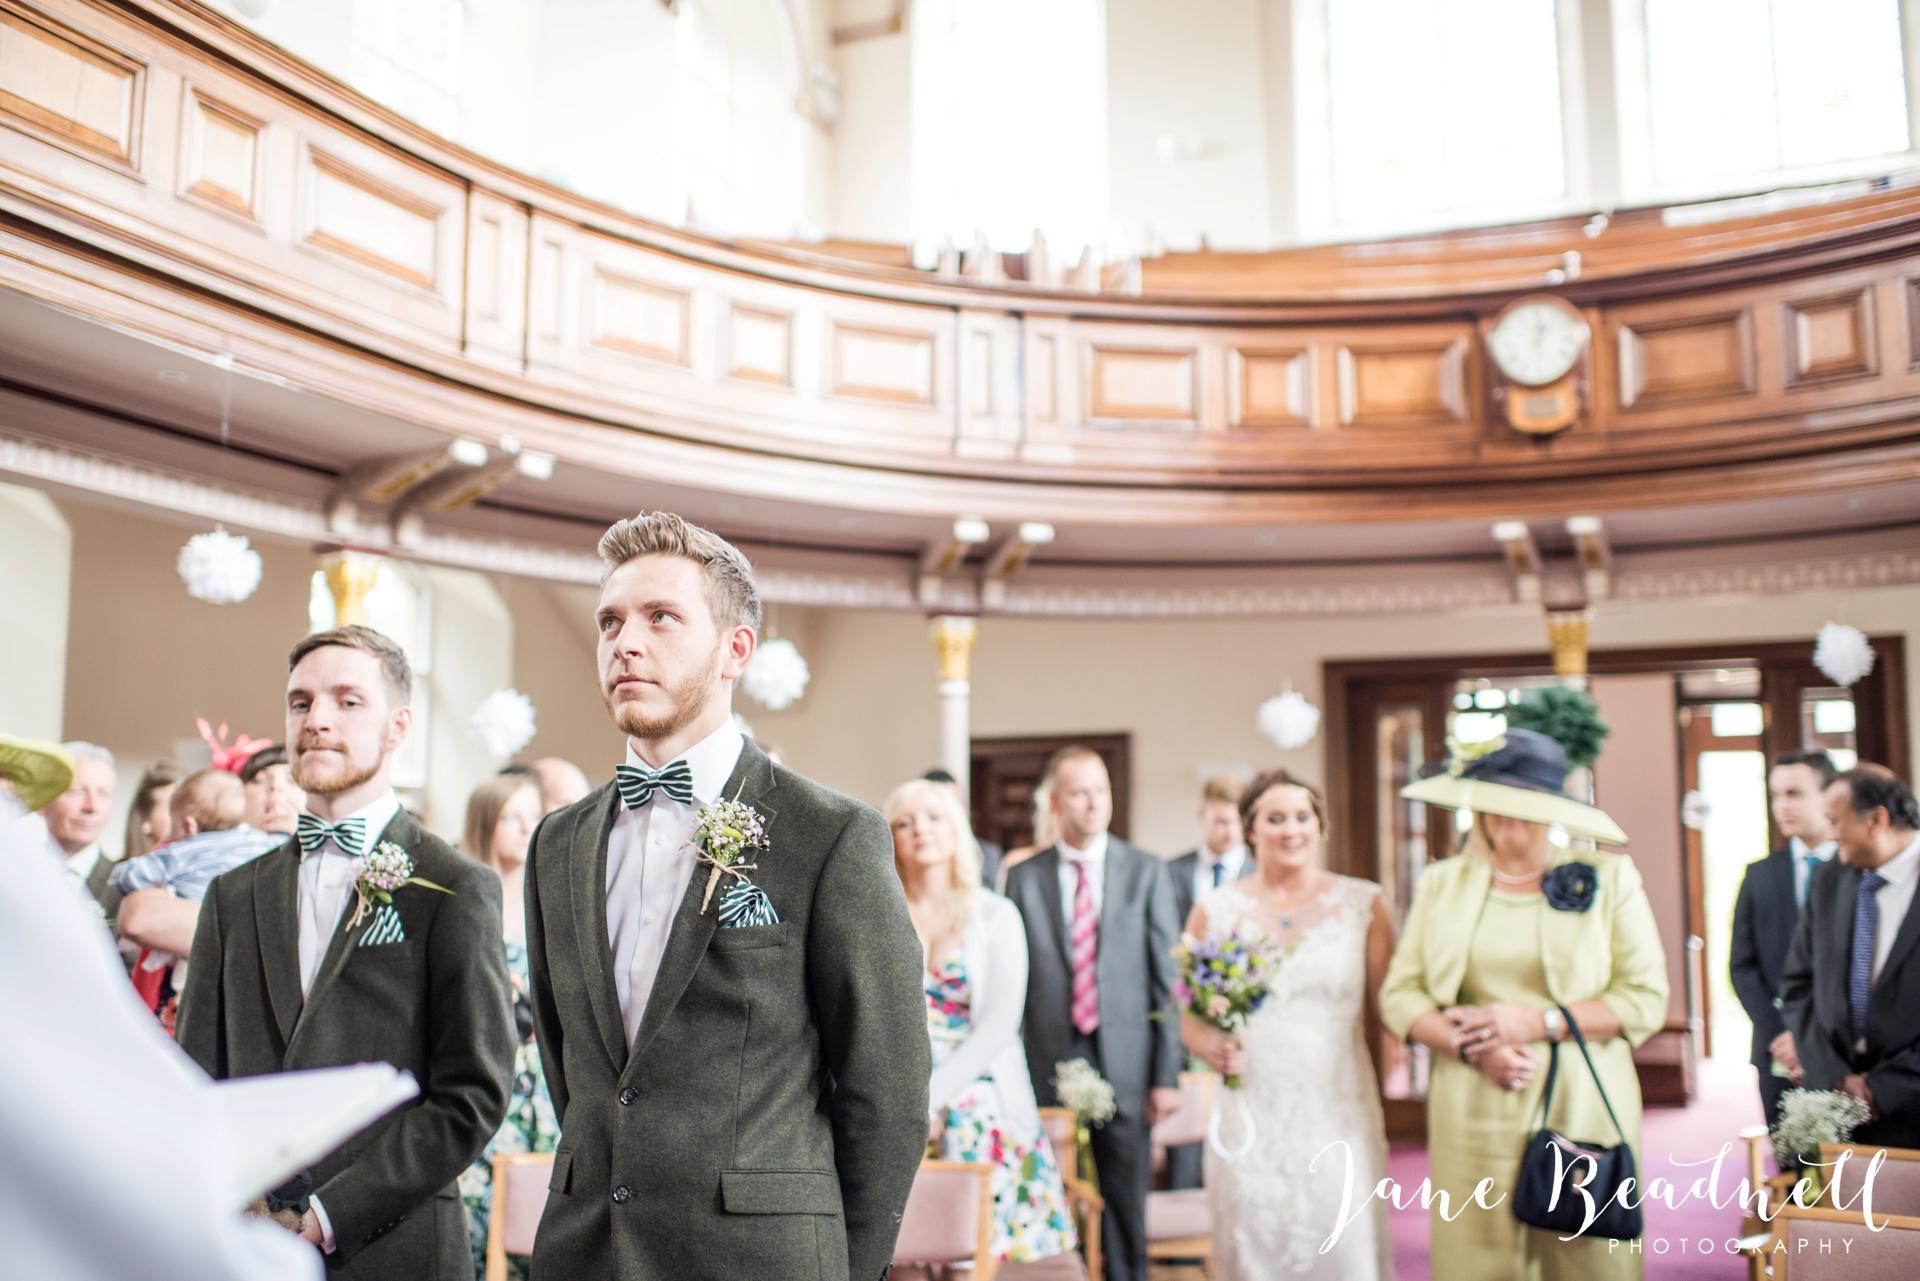 Jane Beadnell fine art wedding photographer The Old Deanery Ripon_0025